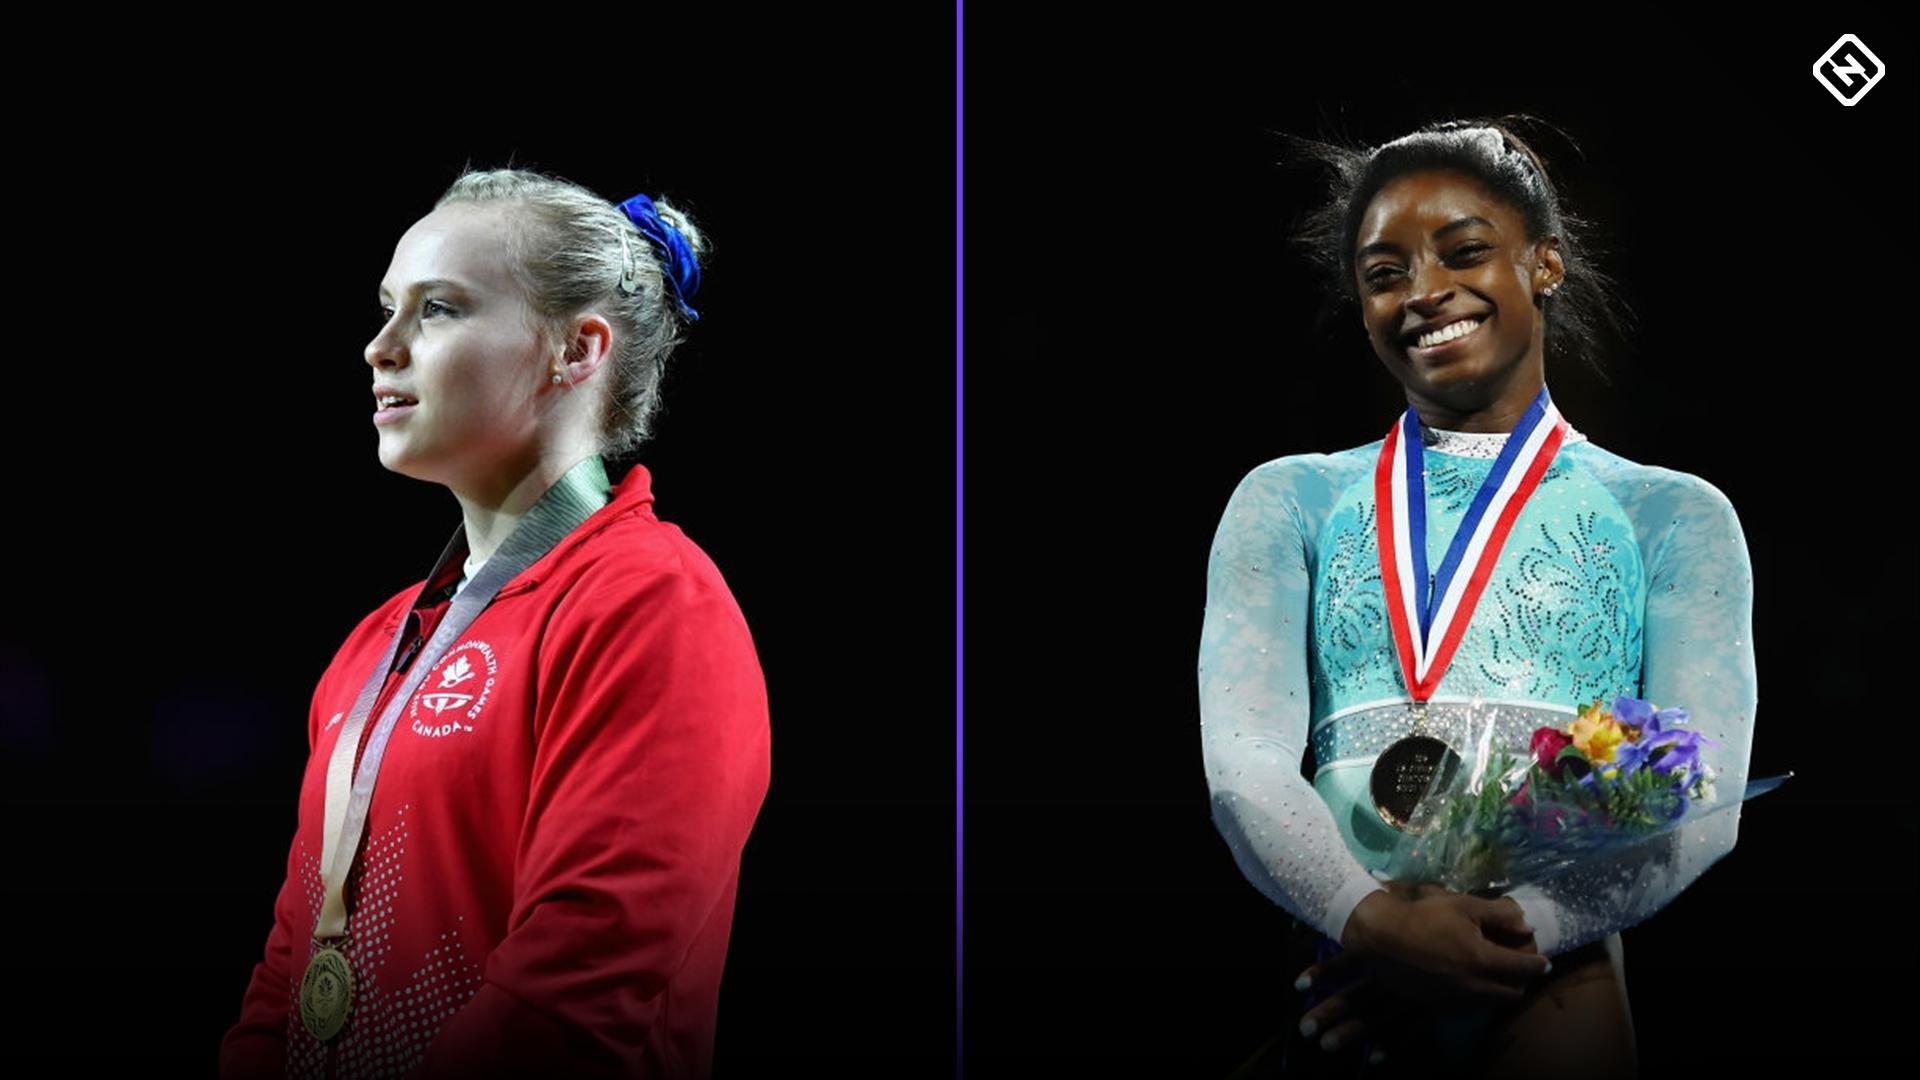 Ellie Black, Simone Biles on DAZN: How to watch, live stream The Superstars of Gymnastics